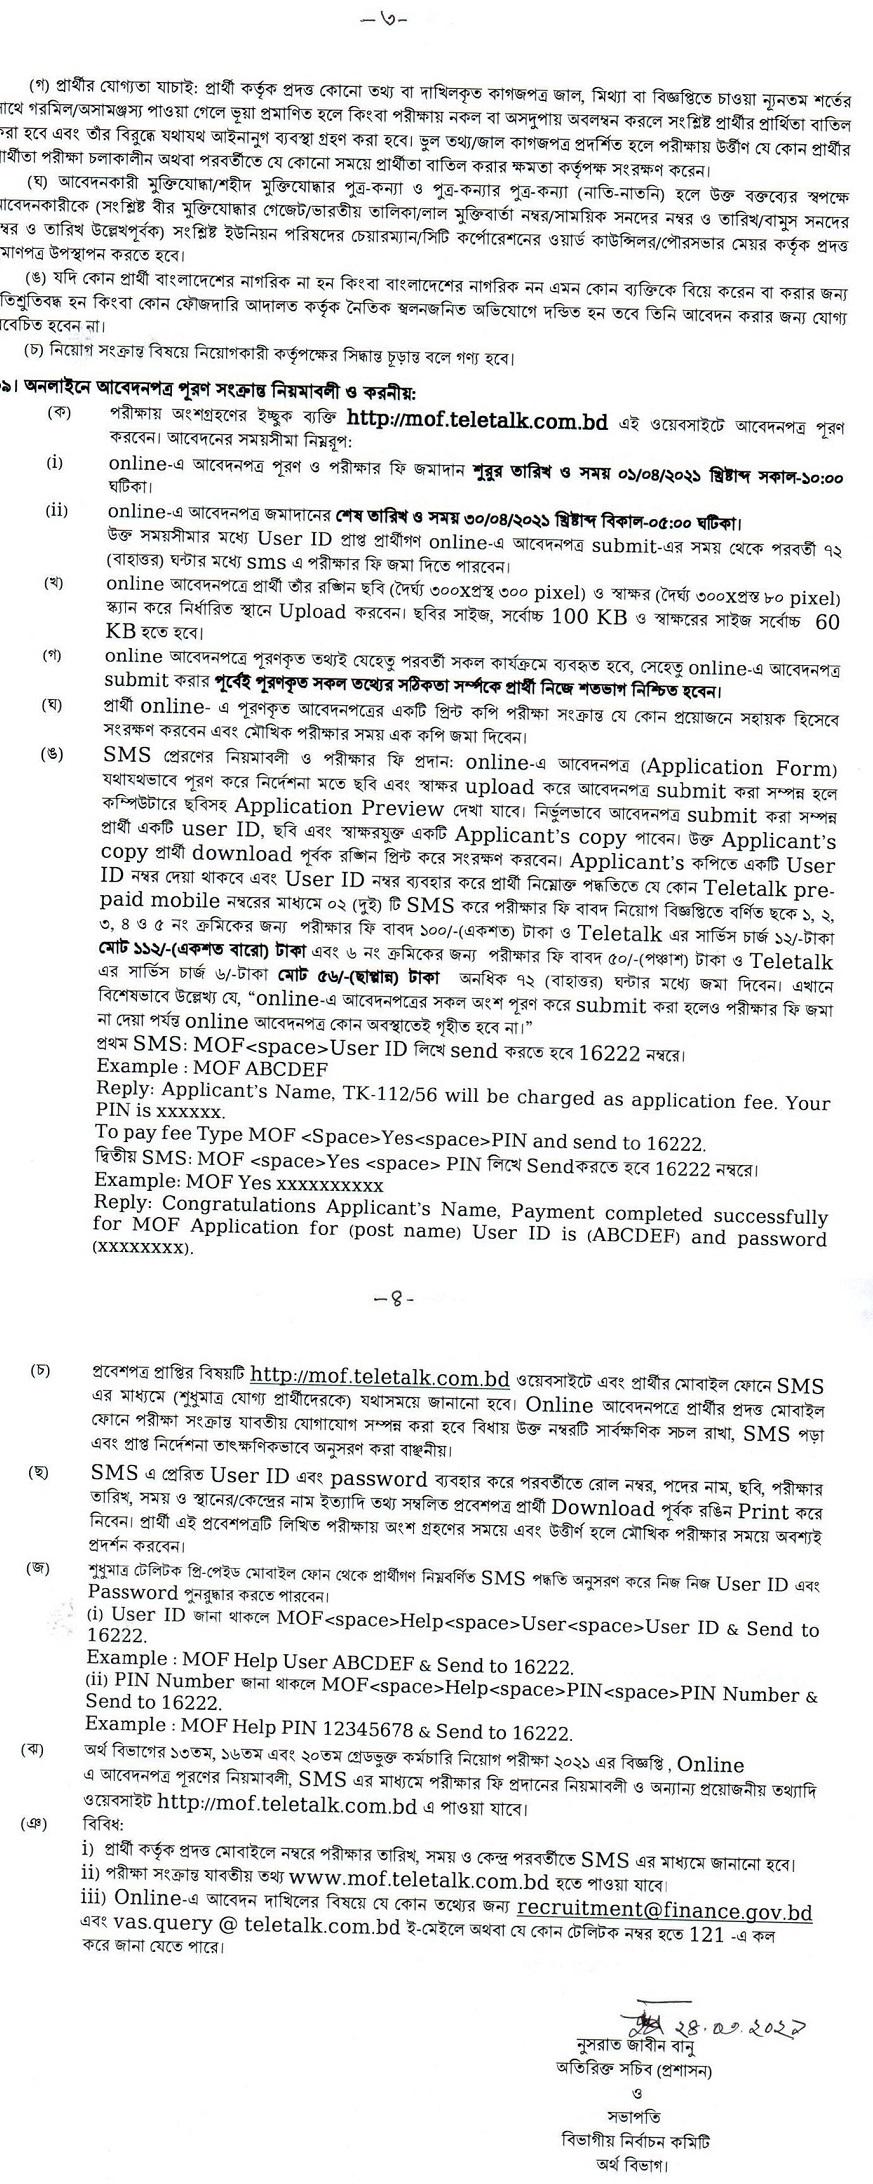 Ministry Of Finance Job Circular 30 April 2021